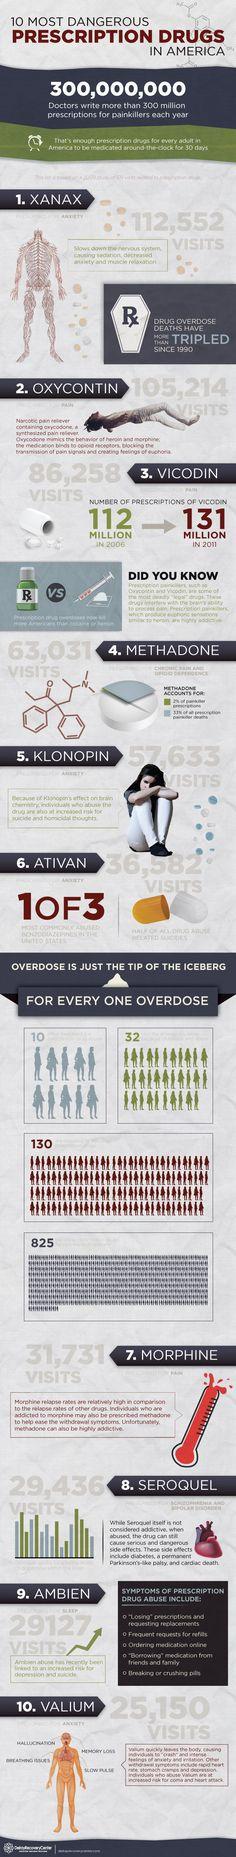 The top 10 most dangerous prescription #drugs in America.